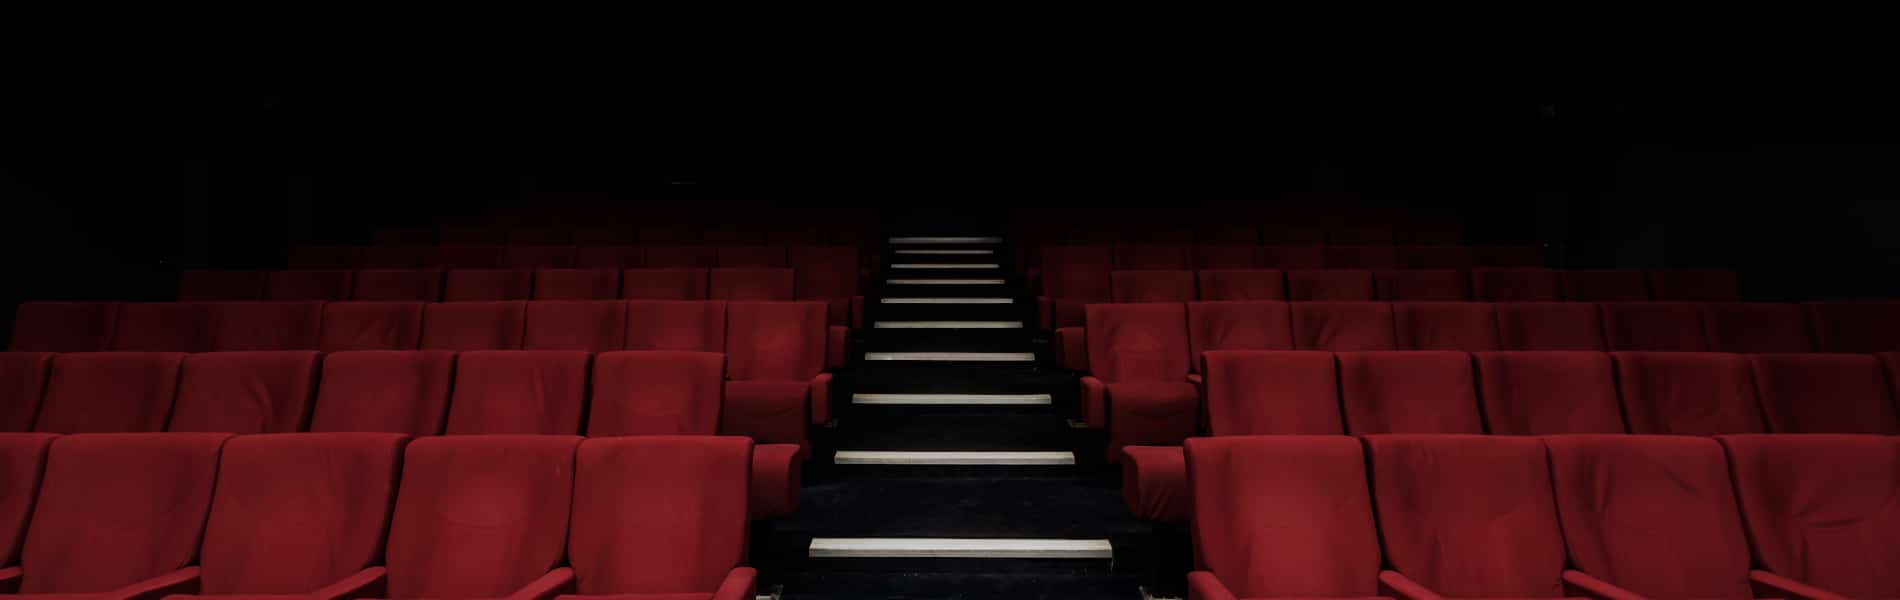 covid-19 wichtige Links & Infos: leere Sitzplätze